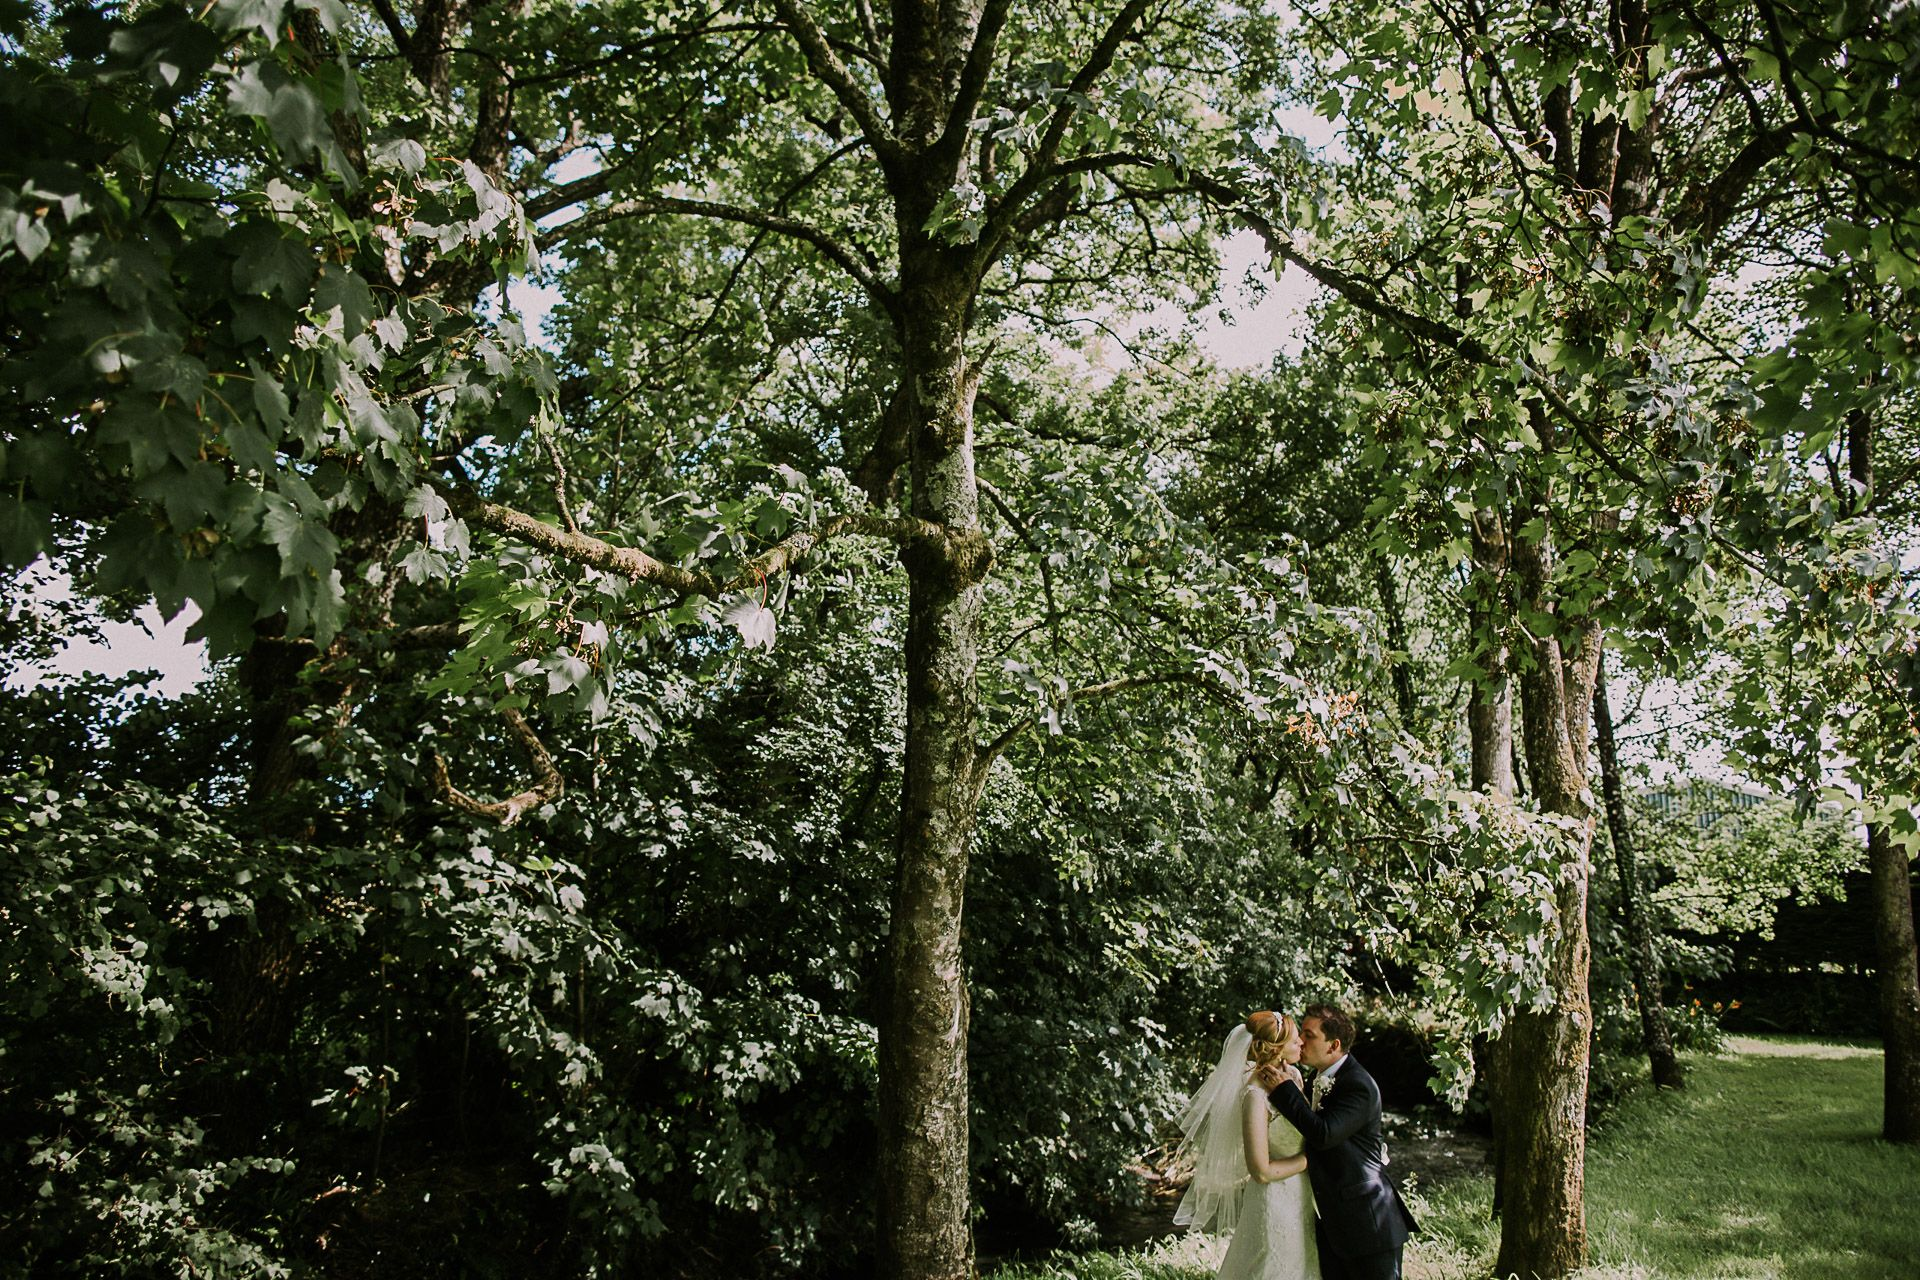 Cornwall Wedding Photographer - Dan Ward Photography.